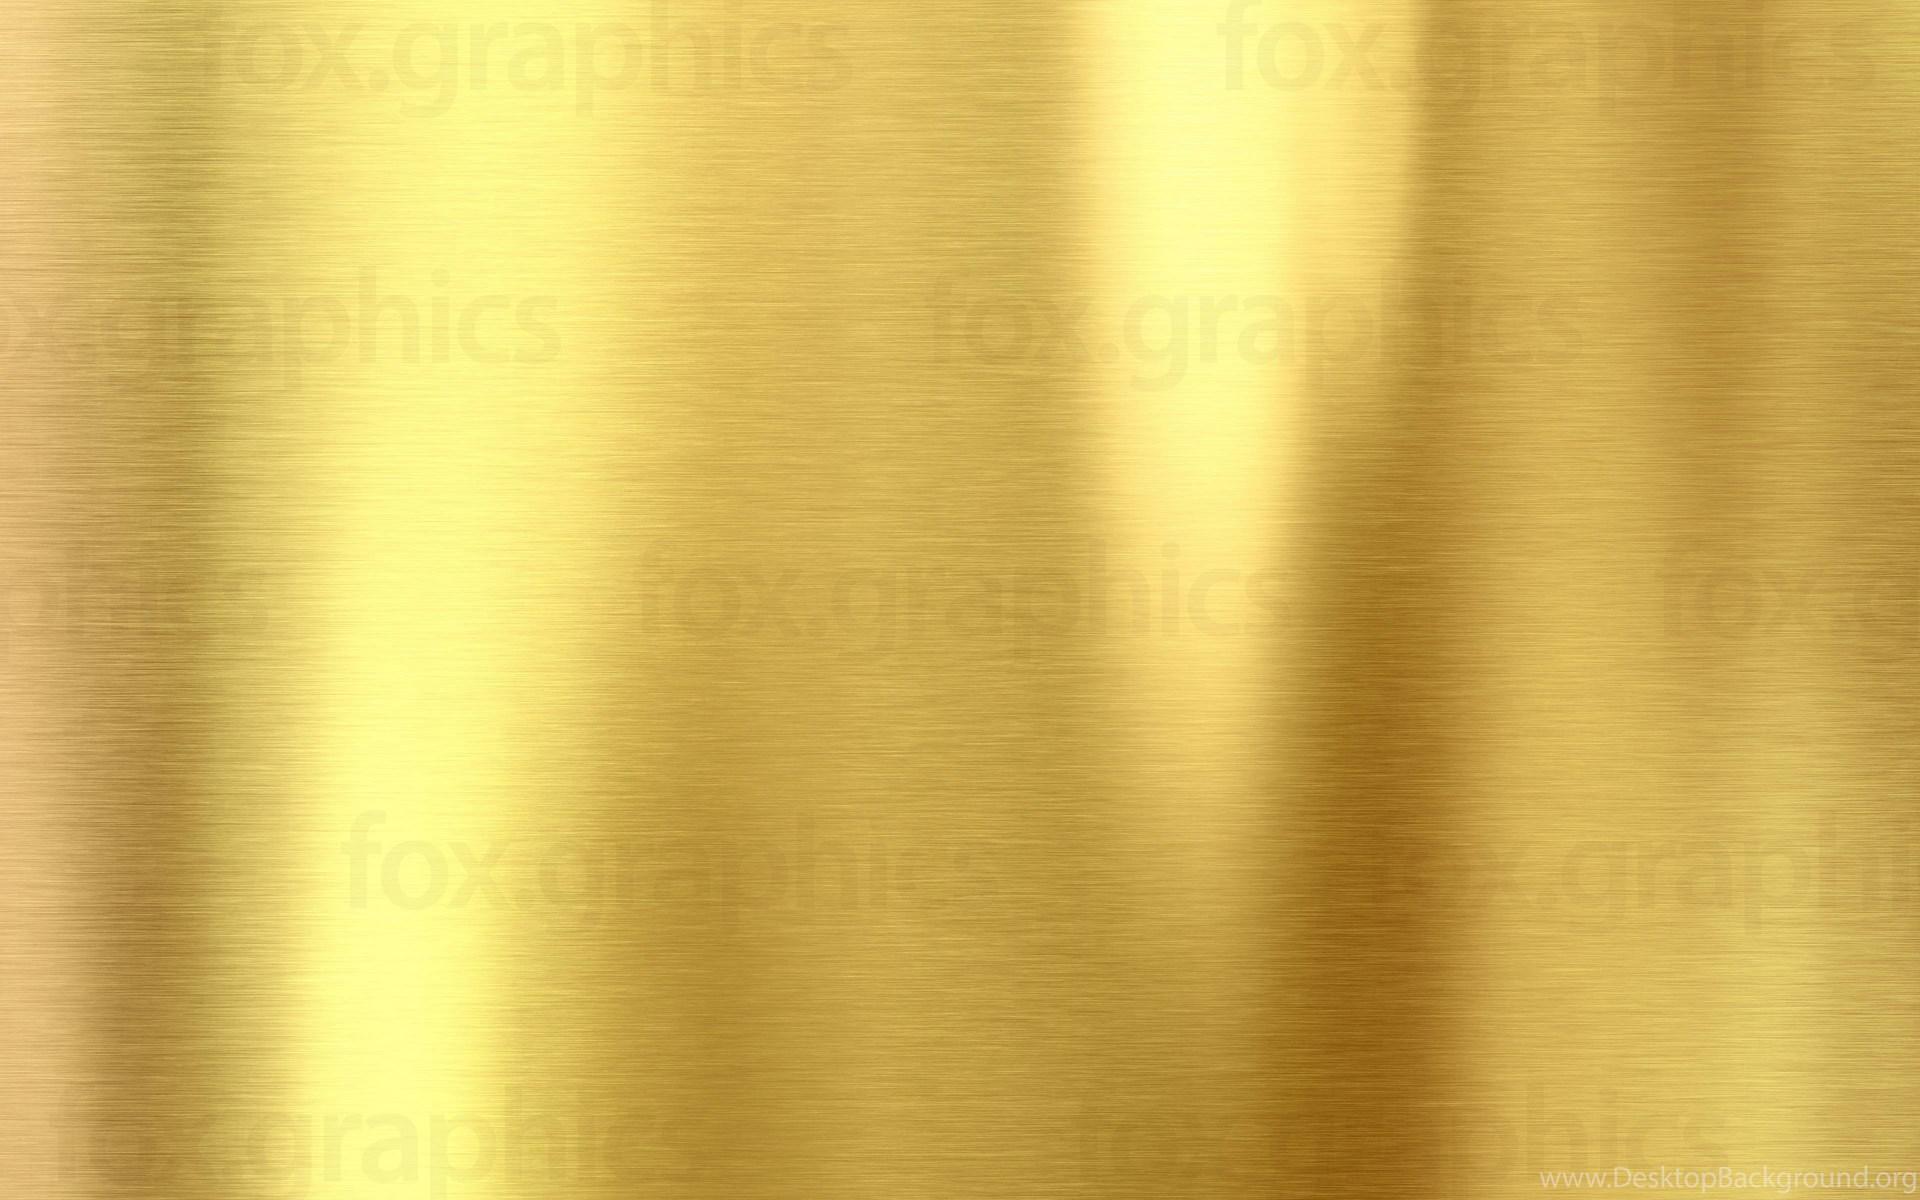 shiny gold metallic wallpapers desktop background